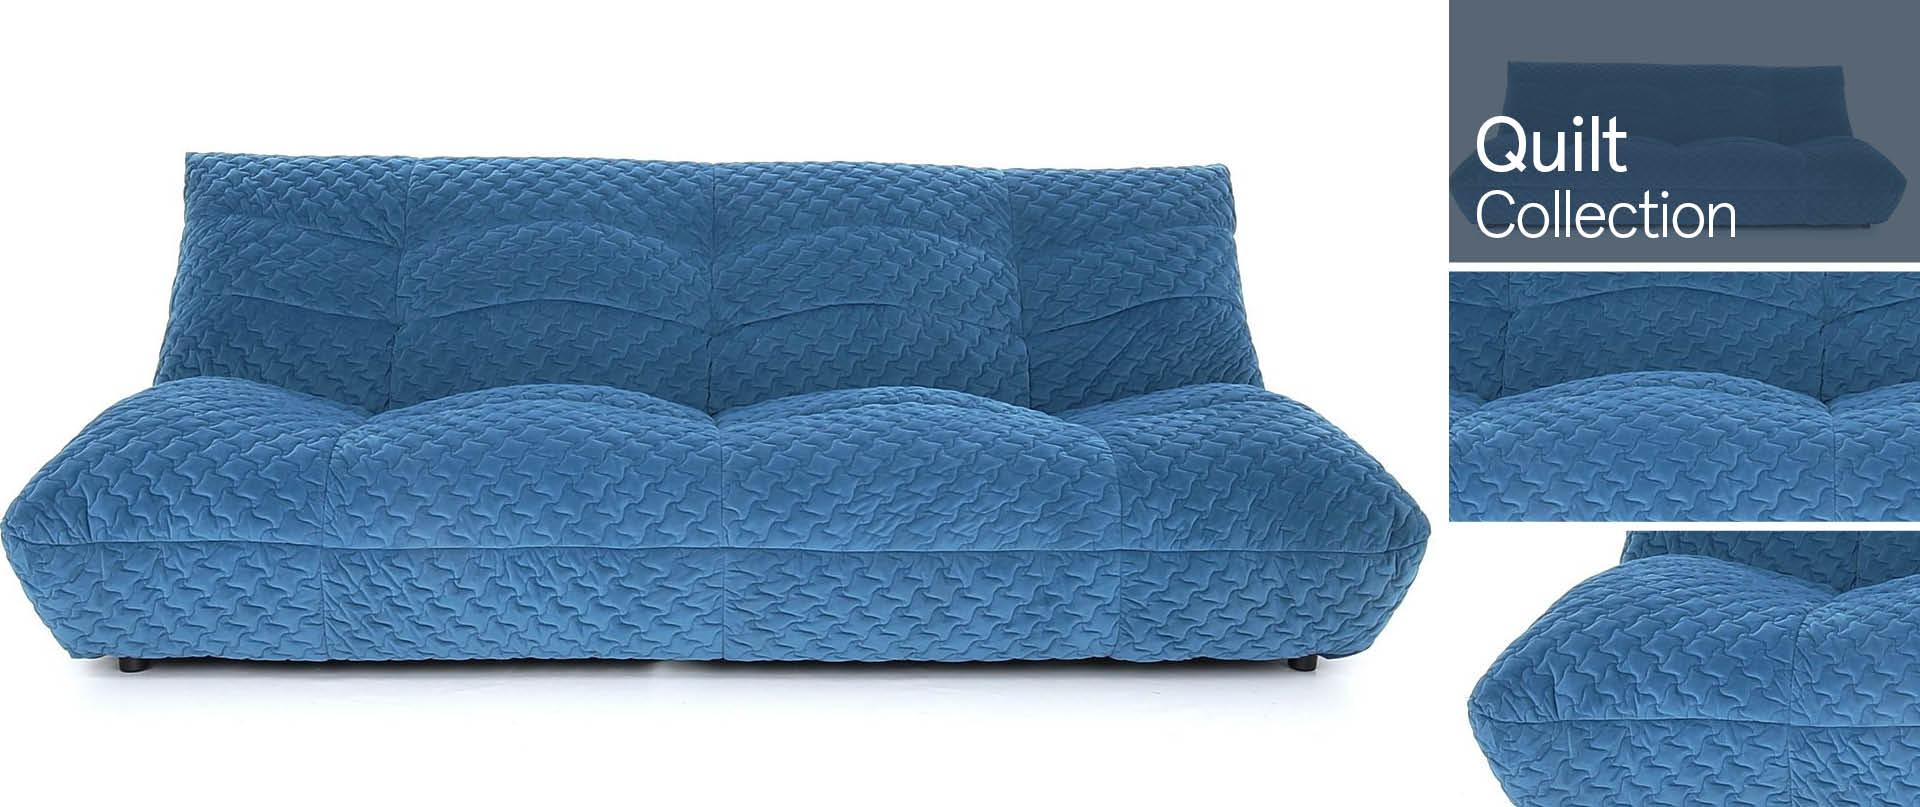 Quilt All Fabric Sofa Ranges